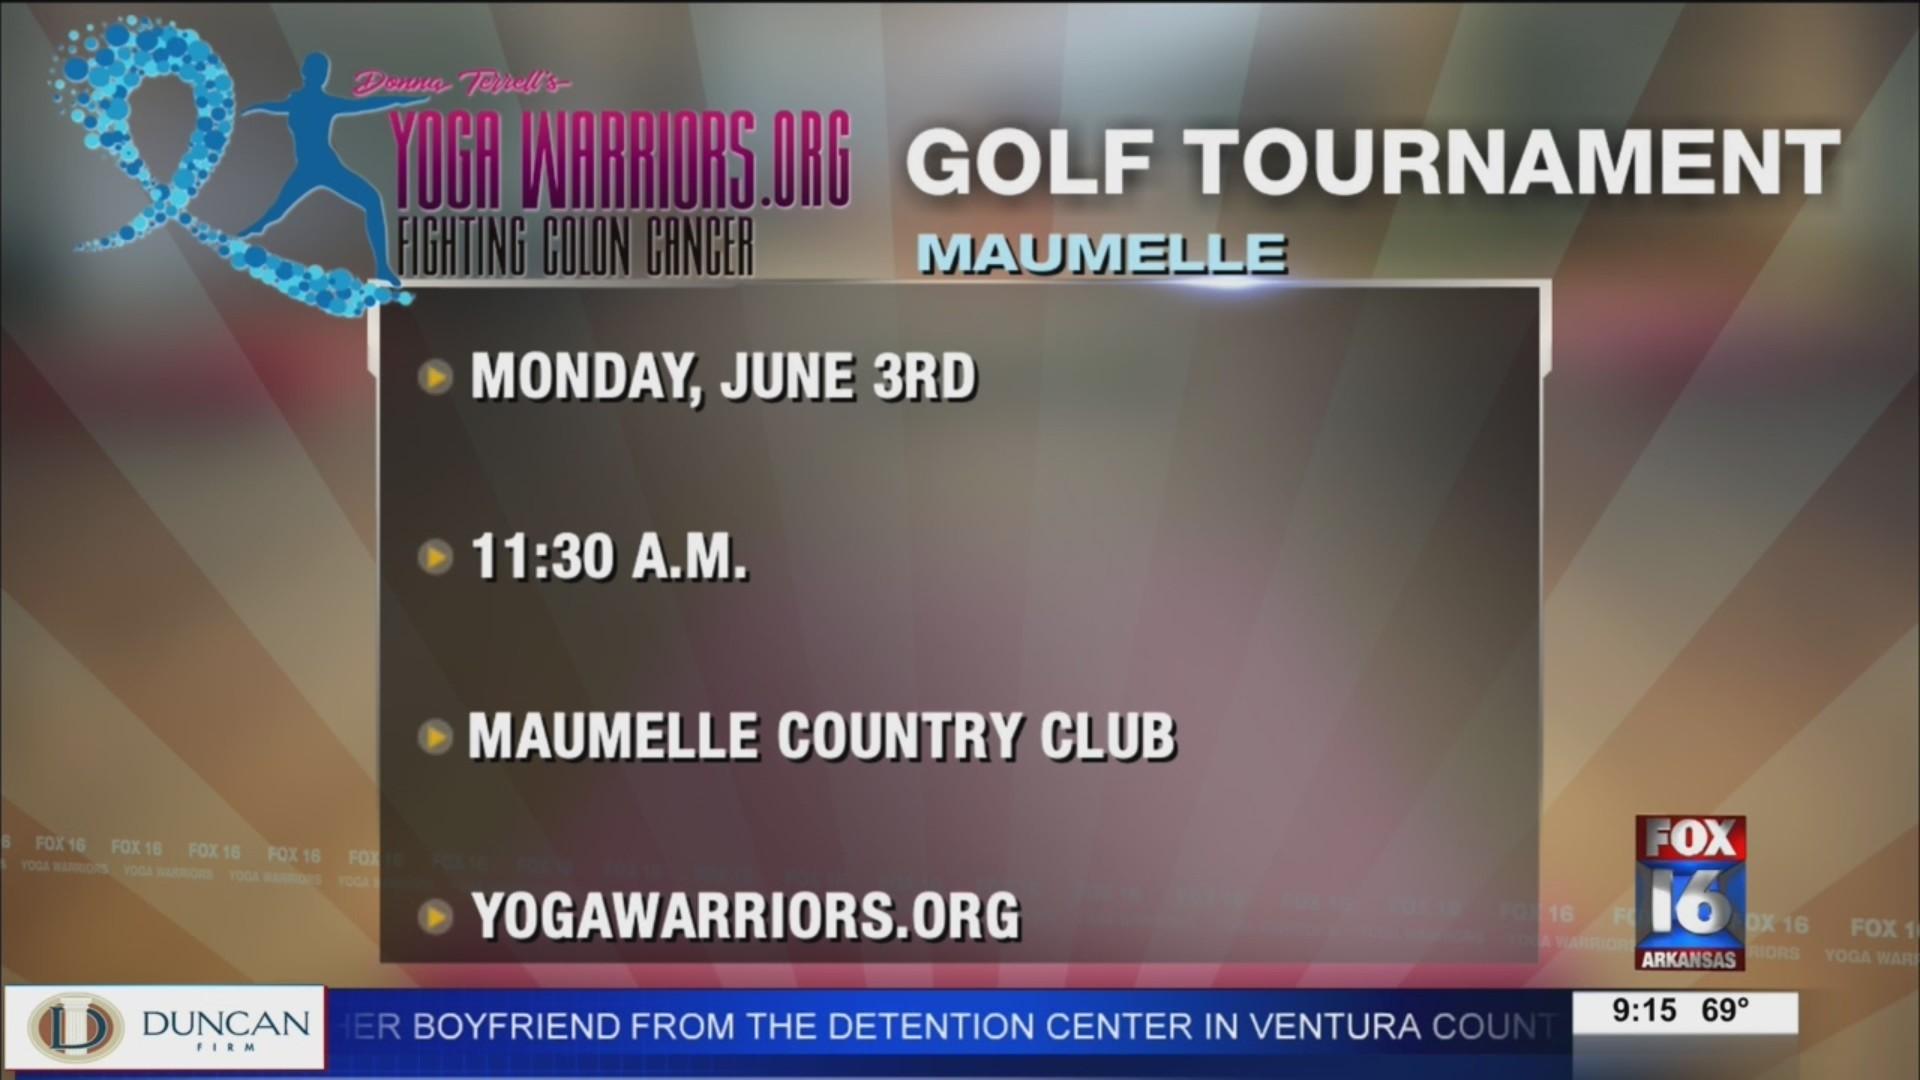 Yoga_Warriors_Golf_Tournament_0_20190515031255